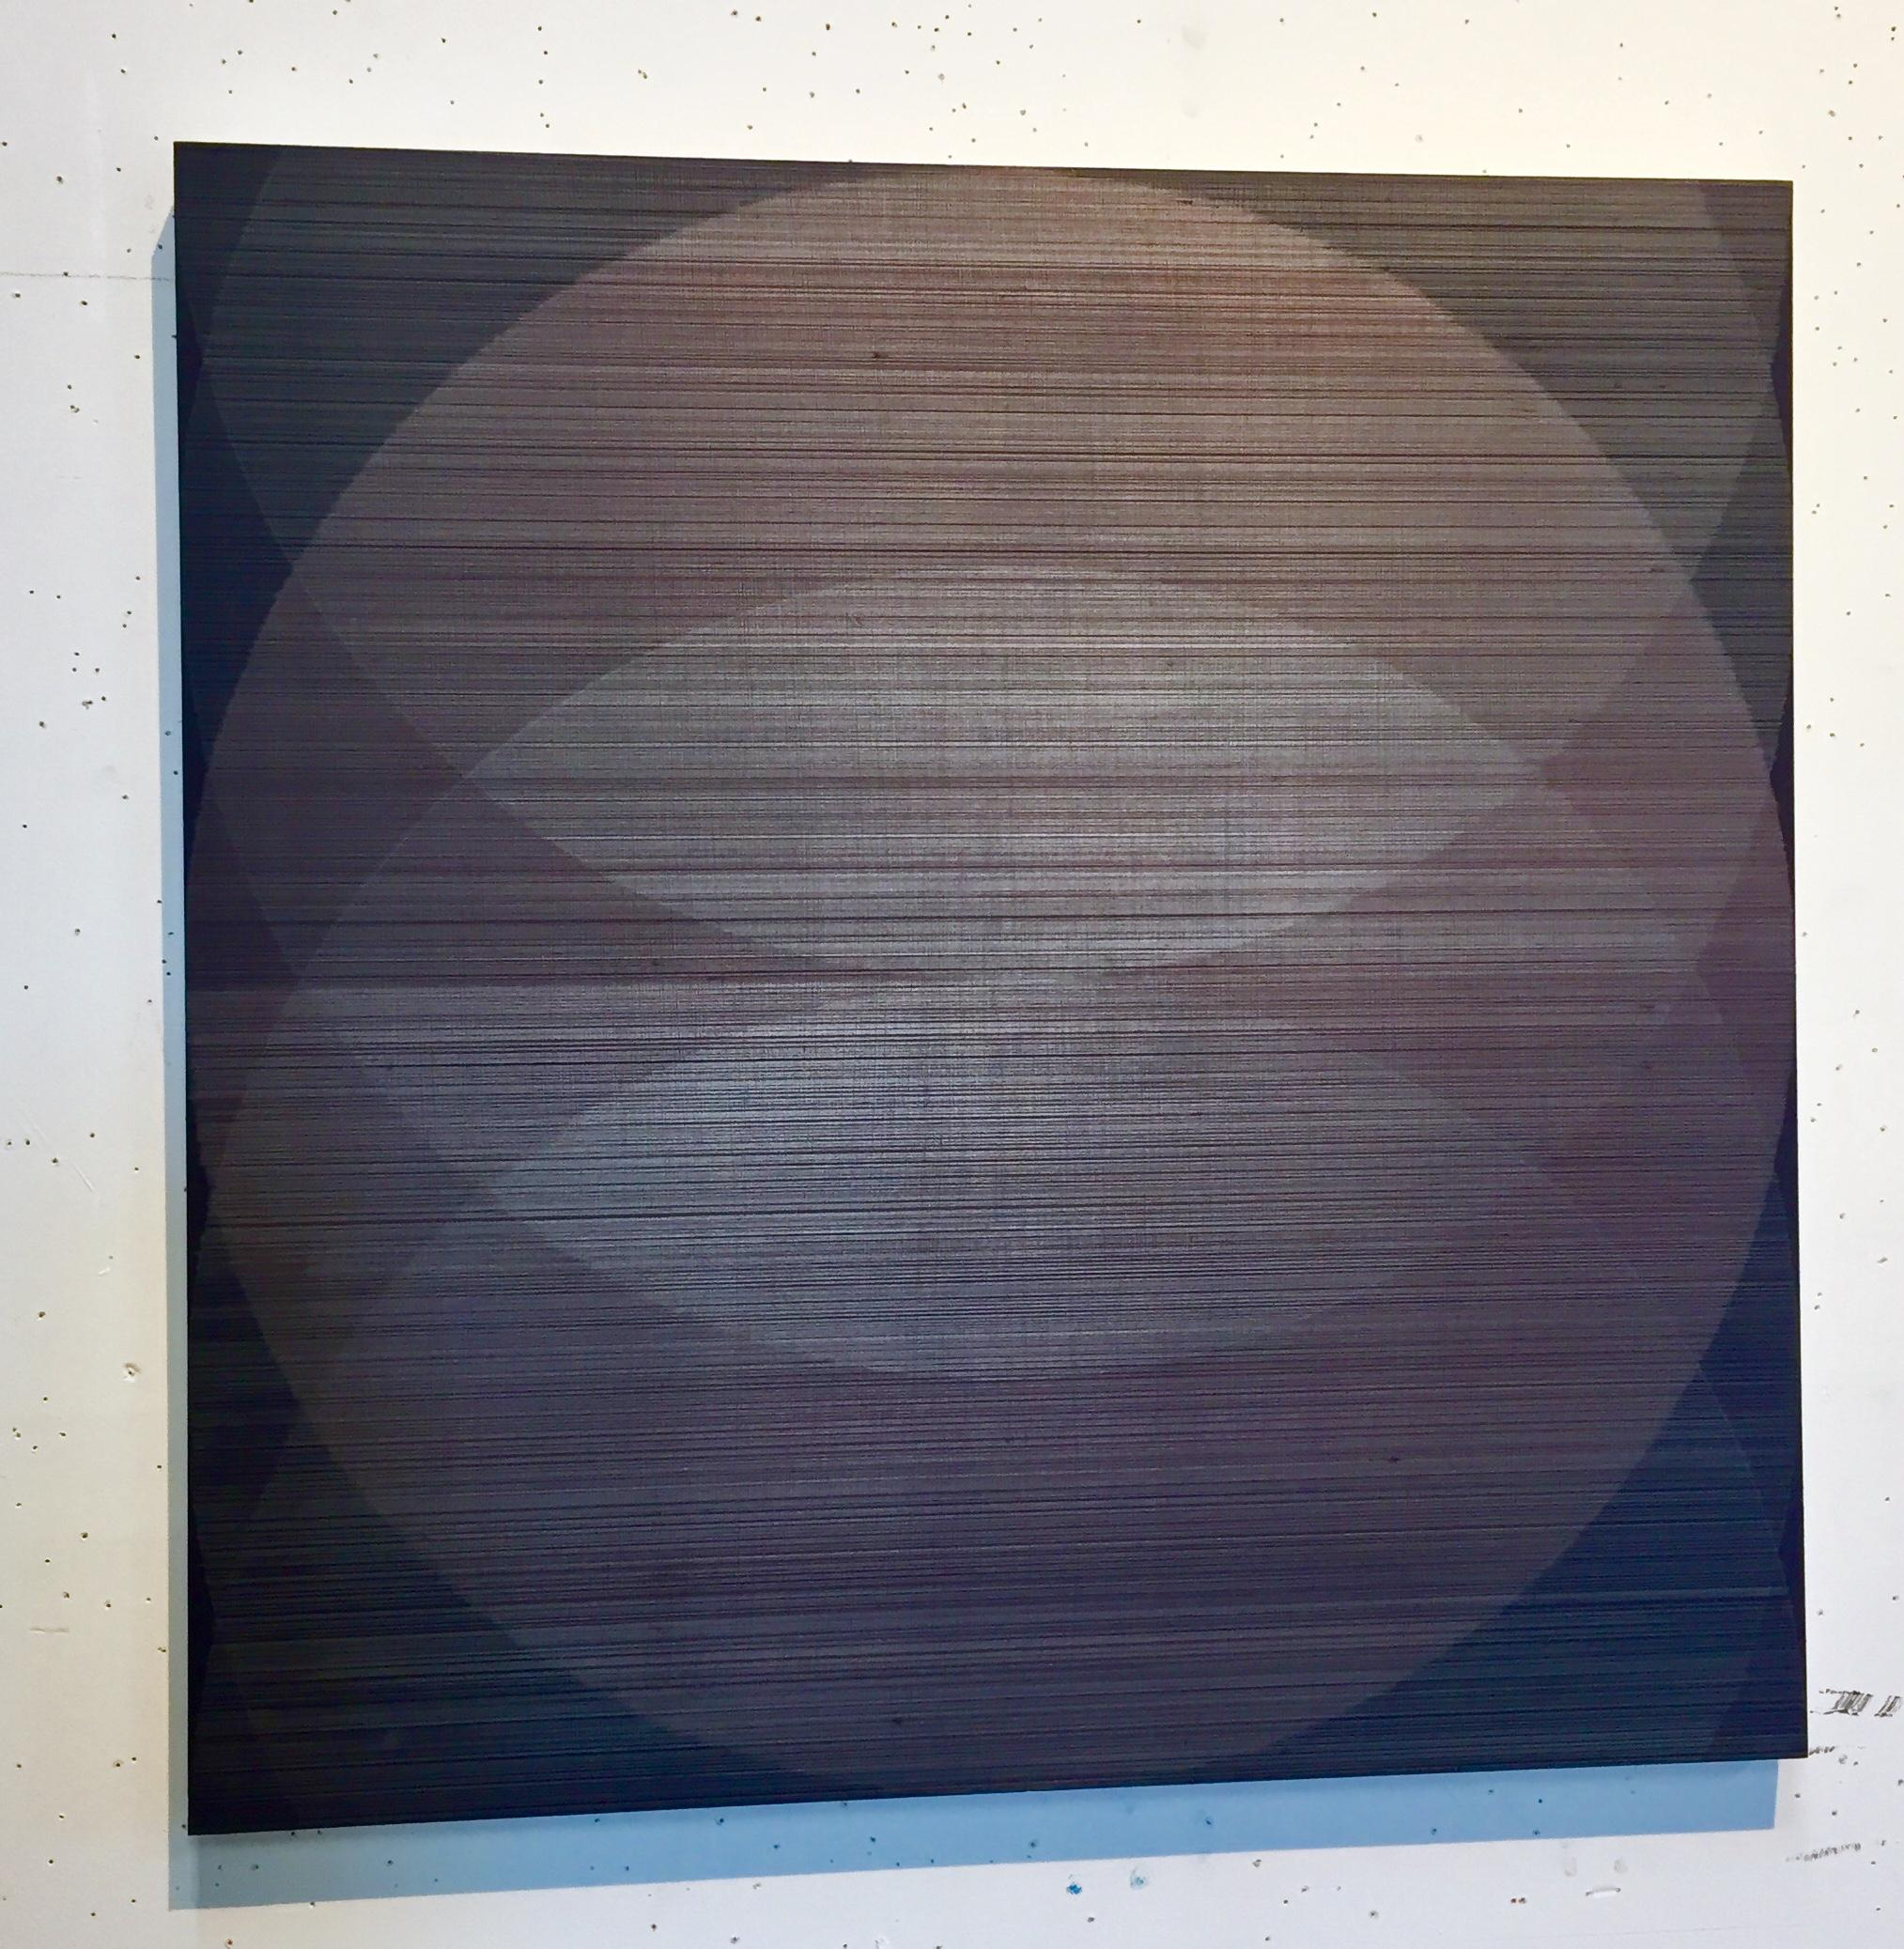 Image for the article on Jonathan Higgins: Inland Art | Jonathan Higgins